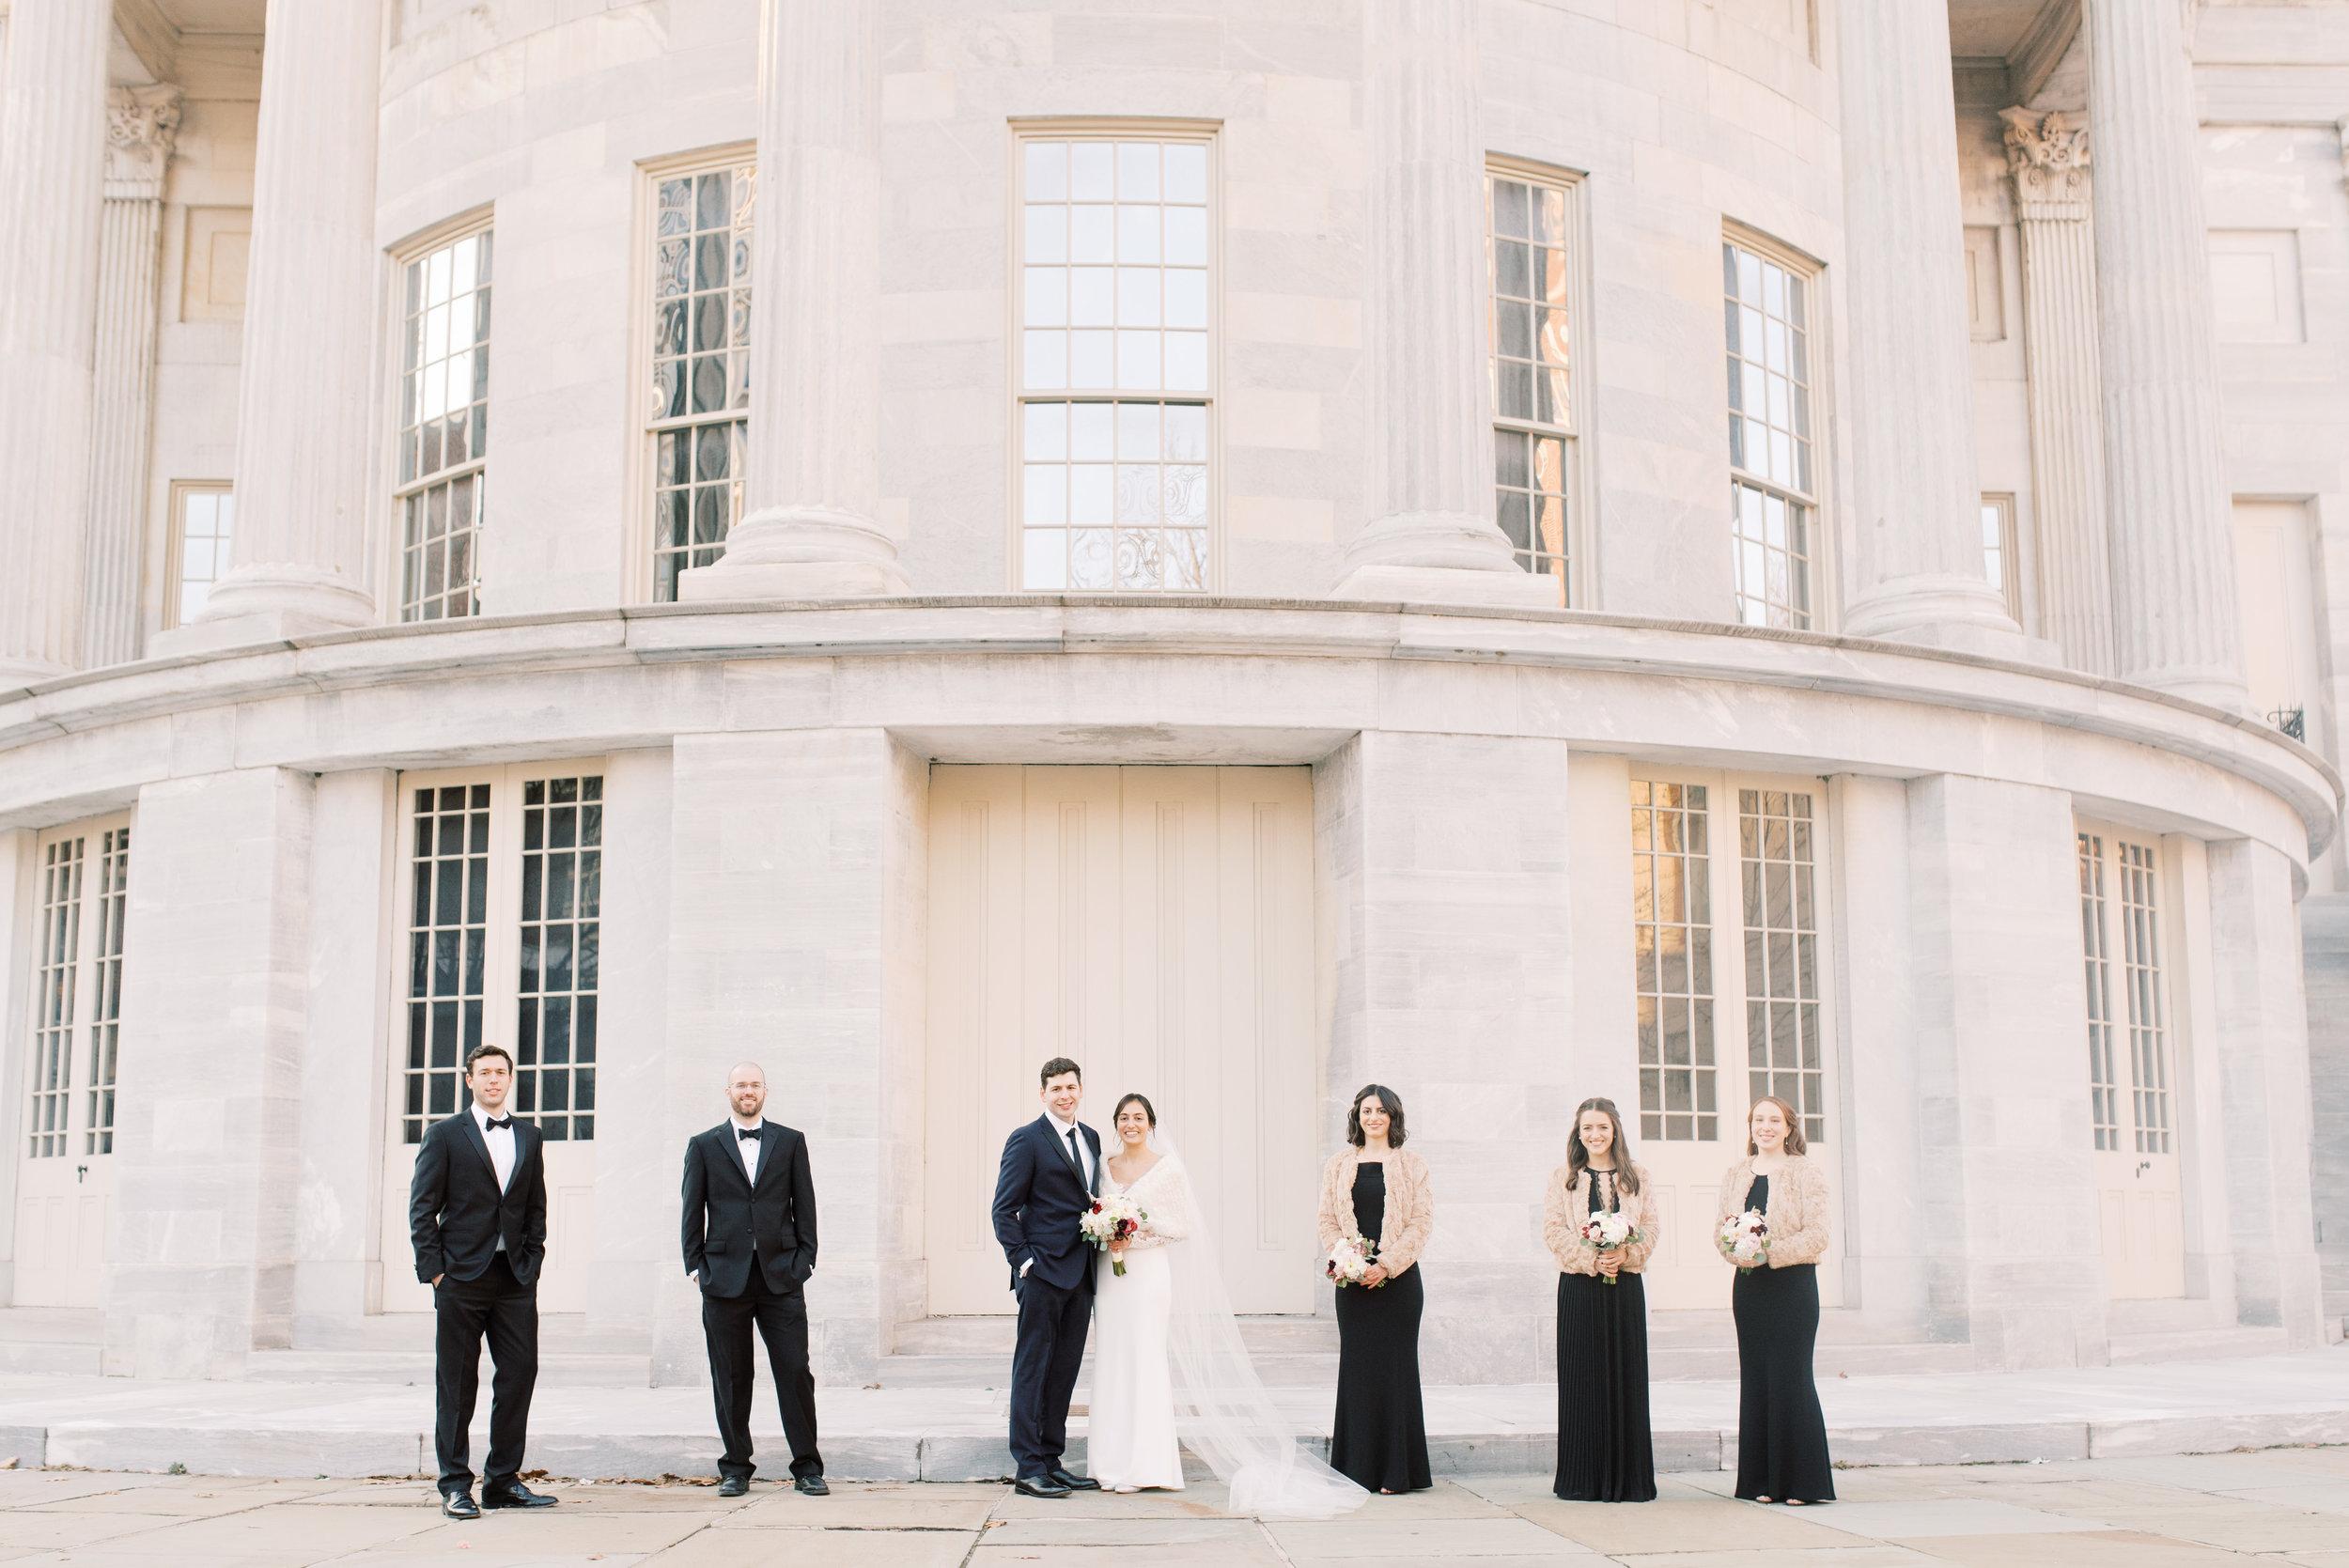 haley-richter-photography-classic-winter-union-trust-philadelphia-wedding-060.jpg